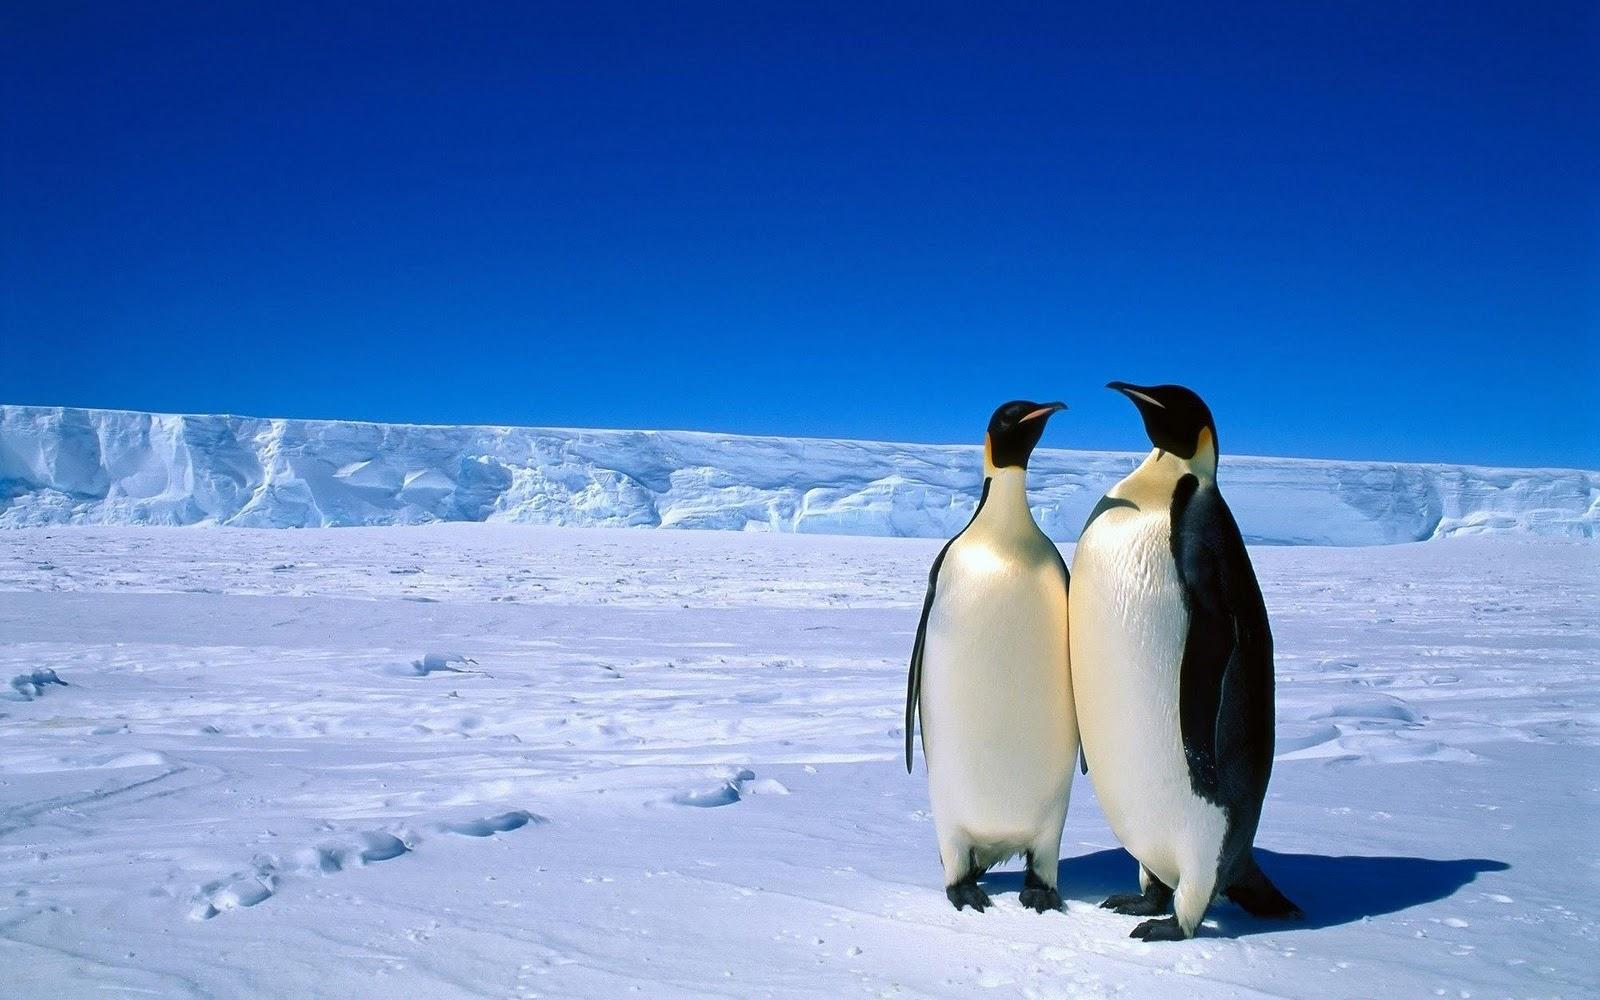 Himalaya Hd Wallpaper Pinguin Achtergronden Hd Wallpapers